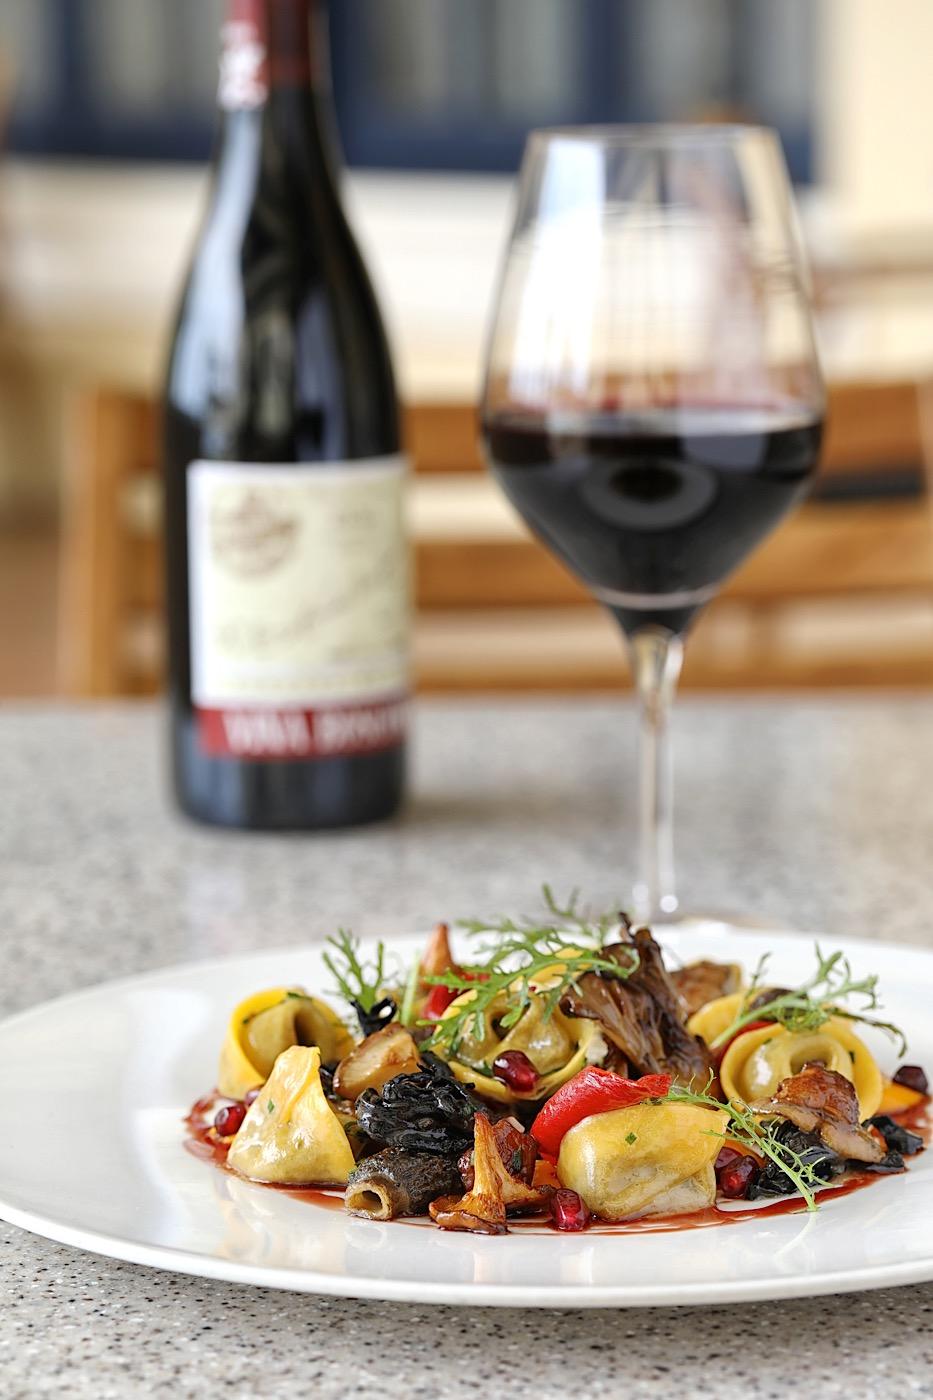 Mushroom Tortellini with 2007 Lopez de Heredia Vina Bosconia Reserva at NINE-TEN Restaurant & Bar